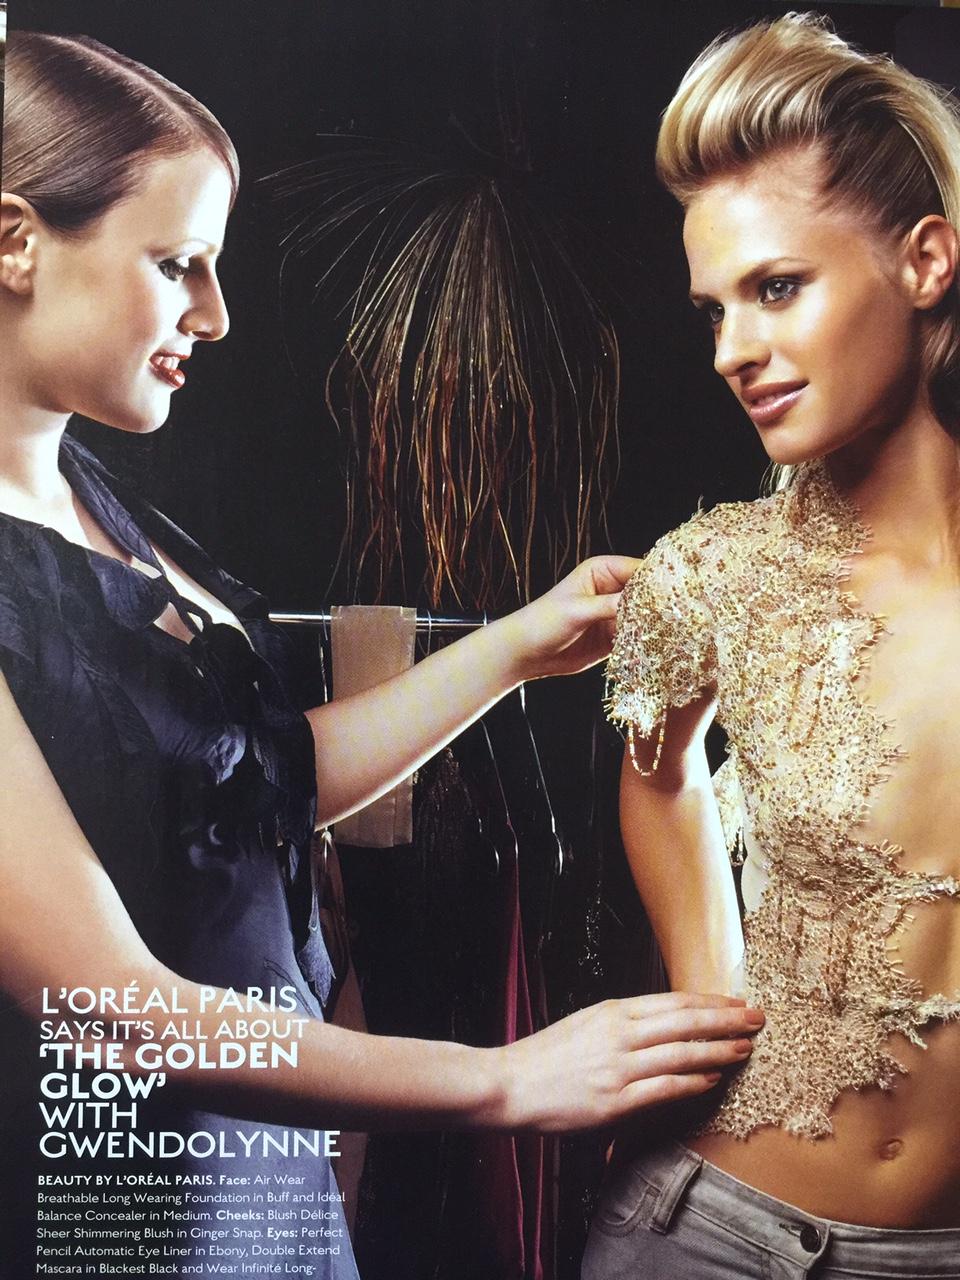 Gwendolynne BurkinFashion Designer L'Oreal Marie Claire .jpg